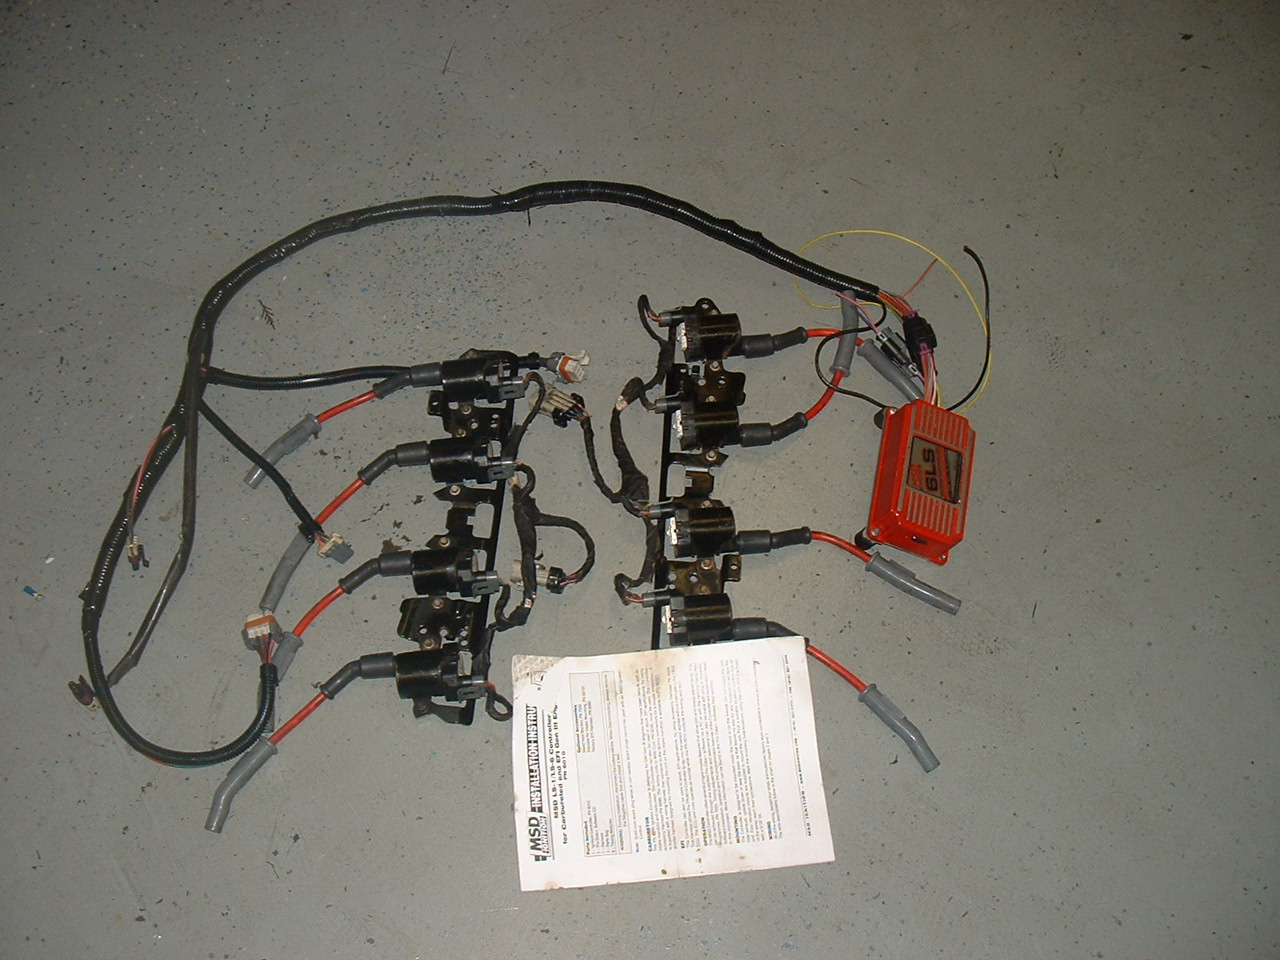 Msd 6ls Wiring msd 6al wiring diagram msd 60143 - jauh ... Msd Wiring Harness on